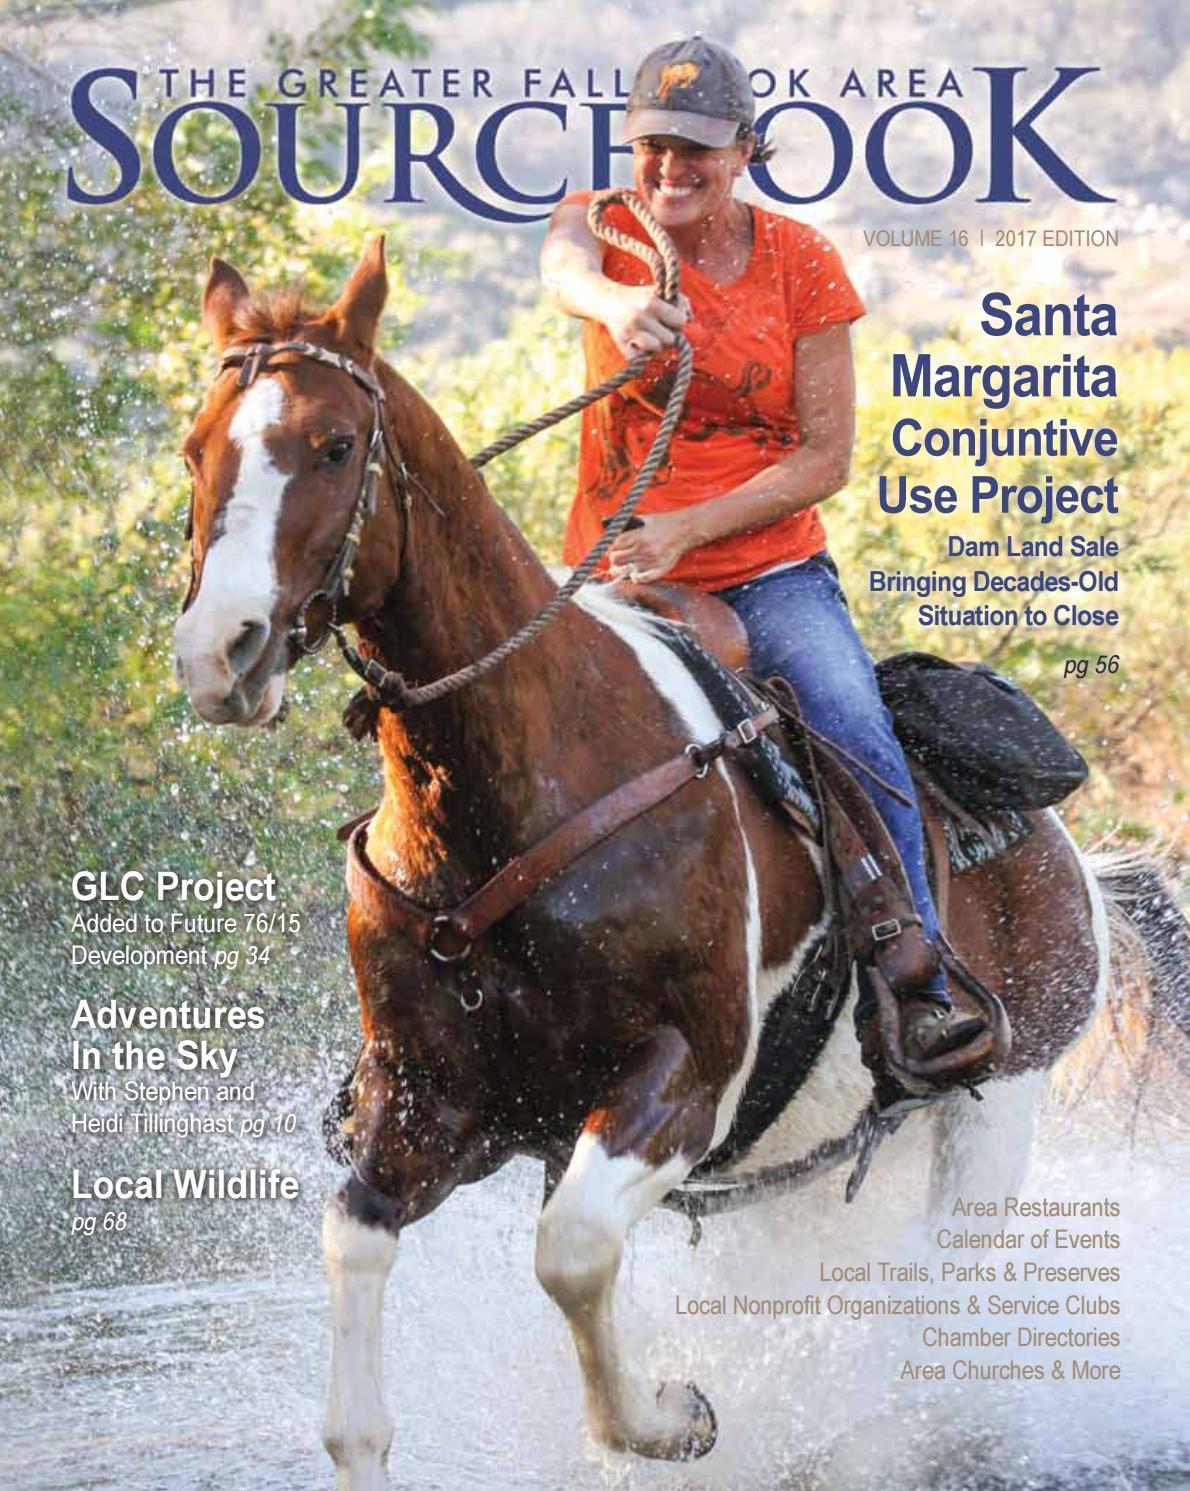 82a5faa4924 Fallbrook Sourcebook 2017 by Village News